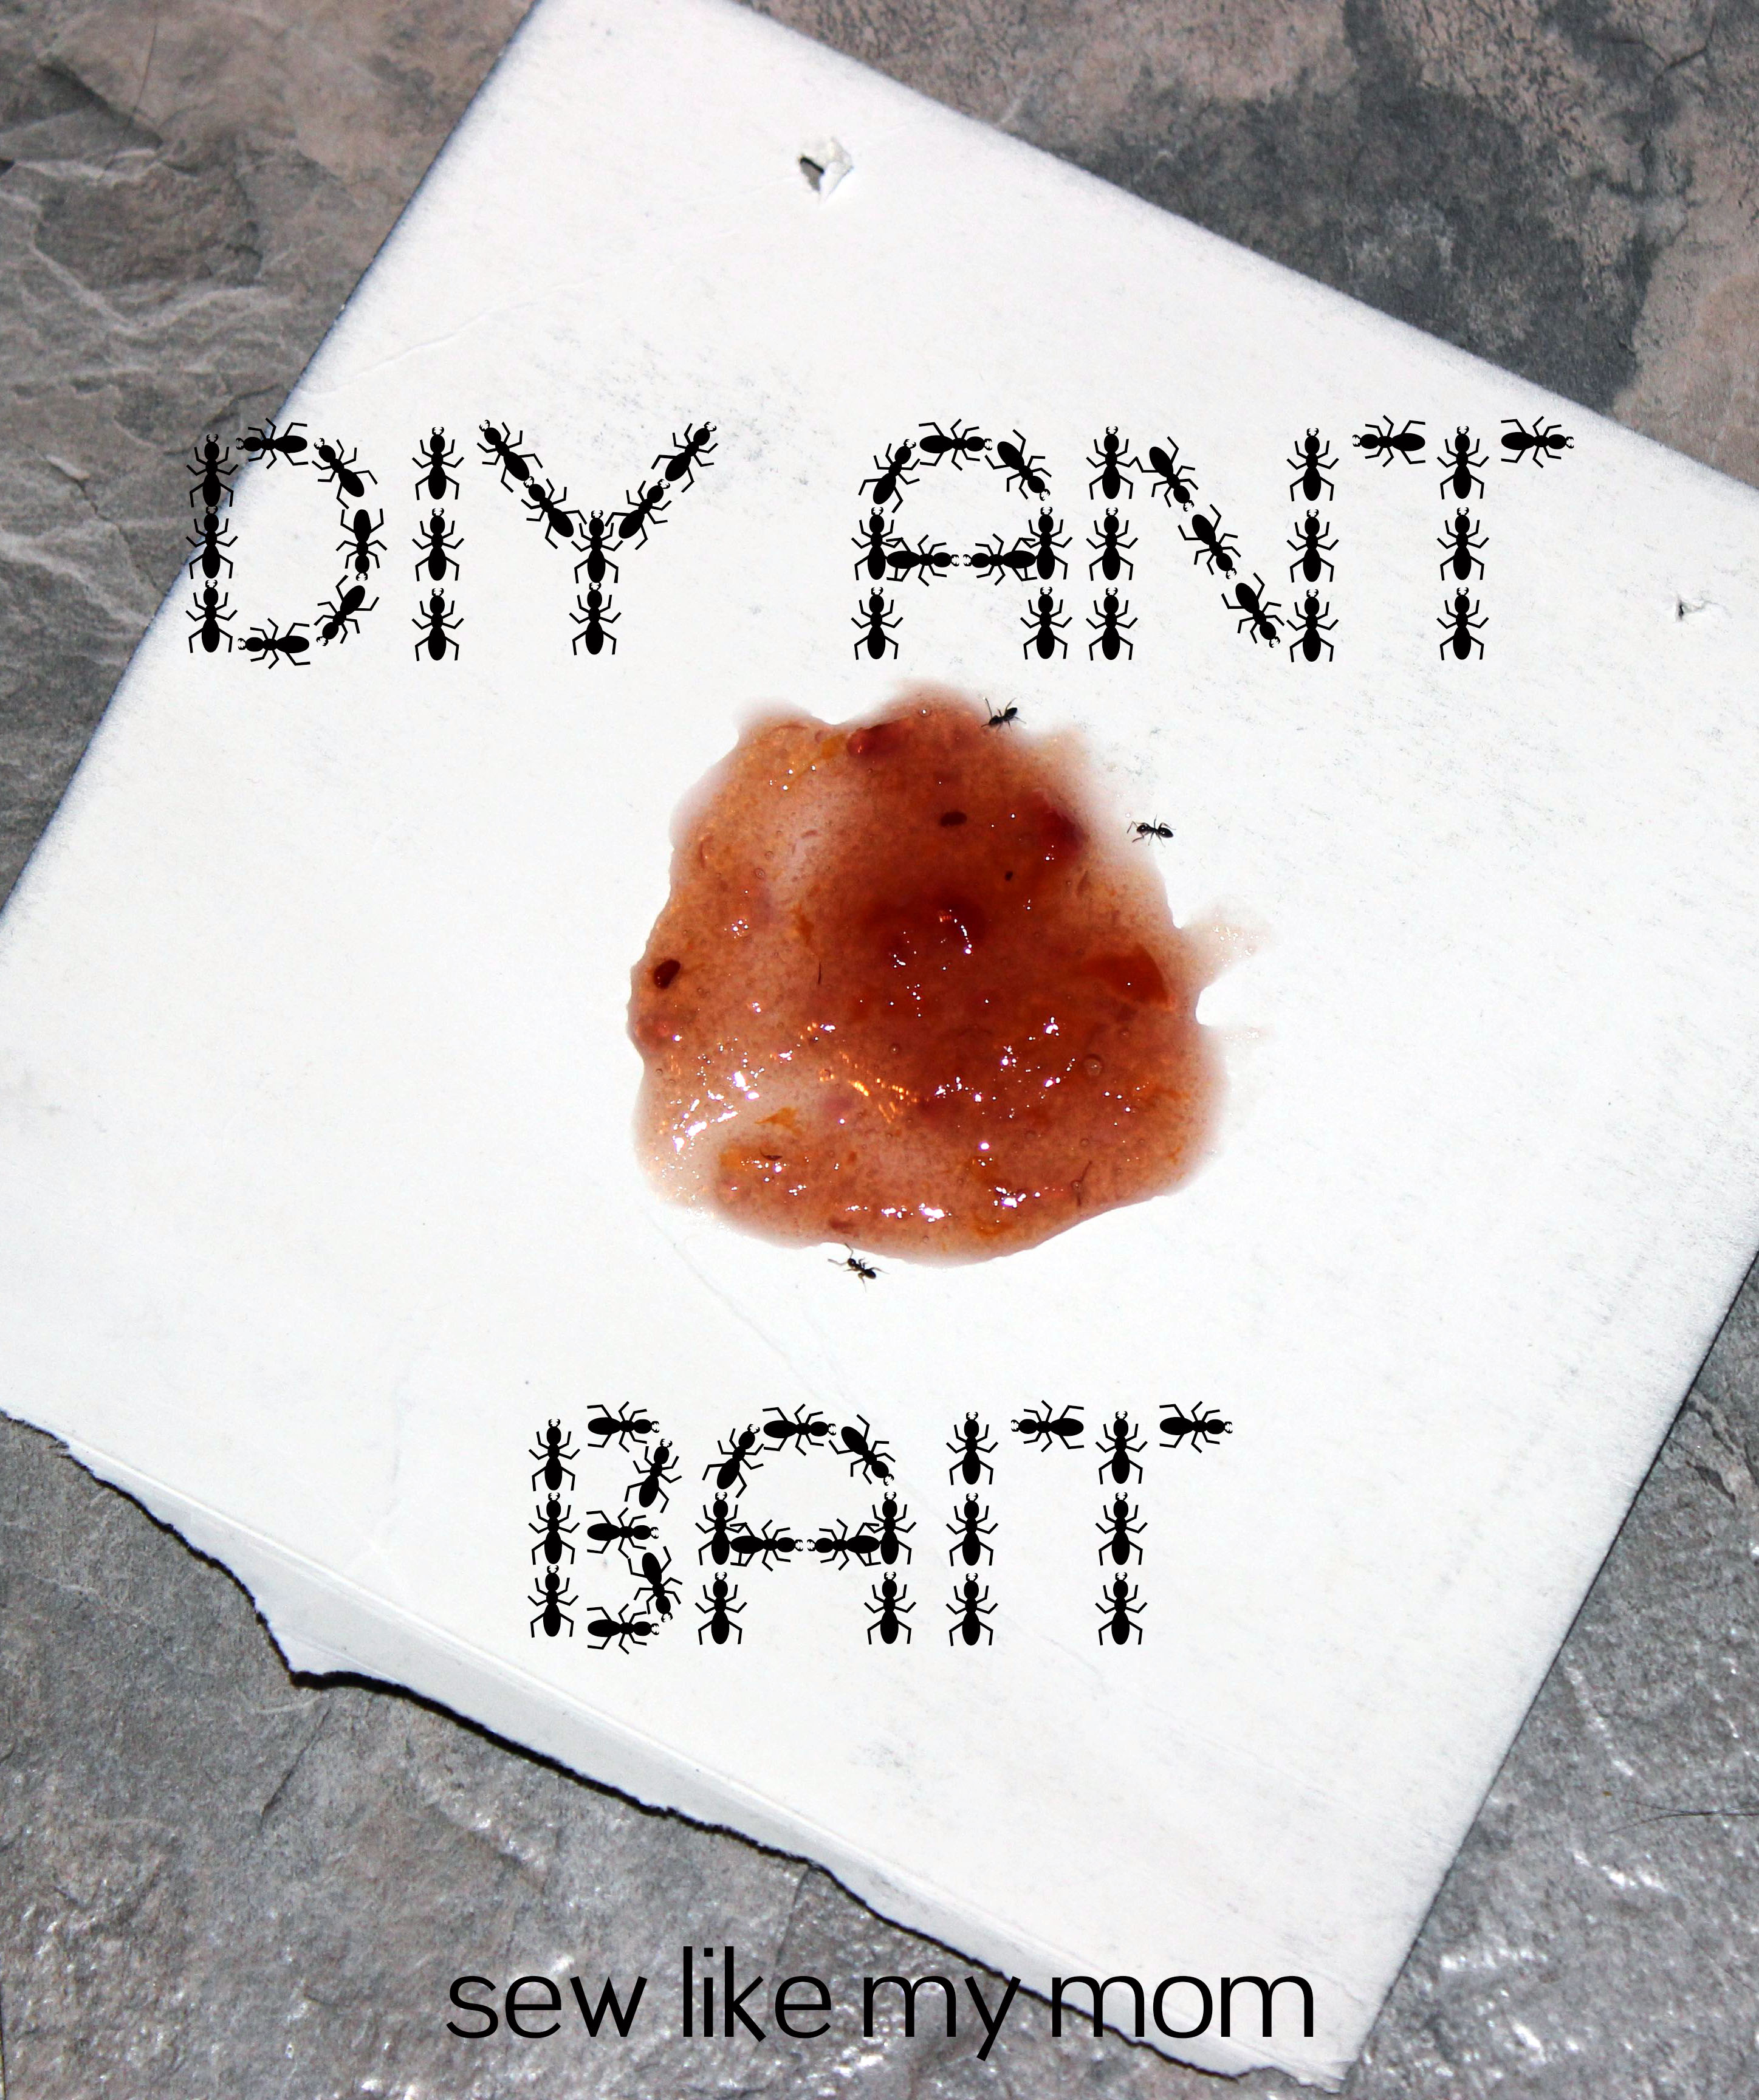 Sew Like My Mom | DIY Ant Bait